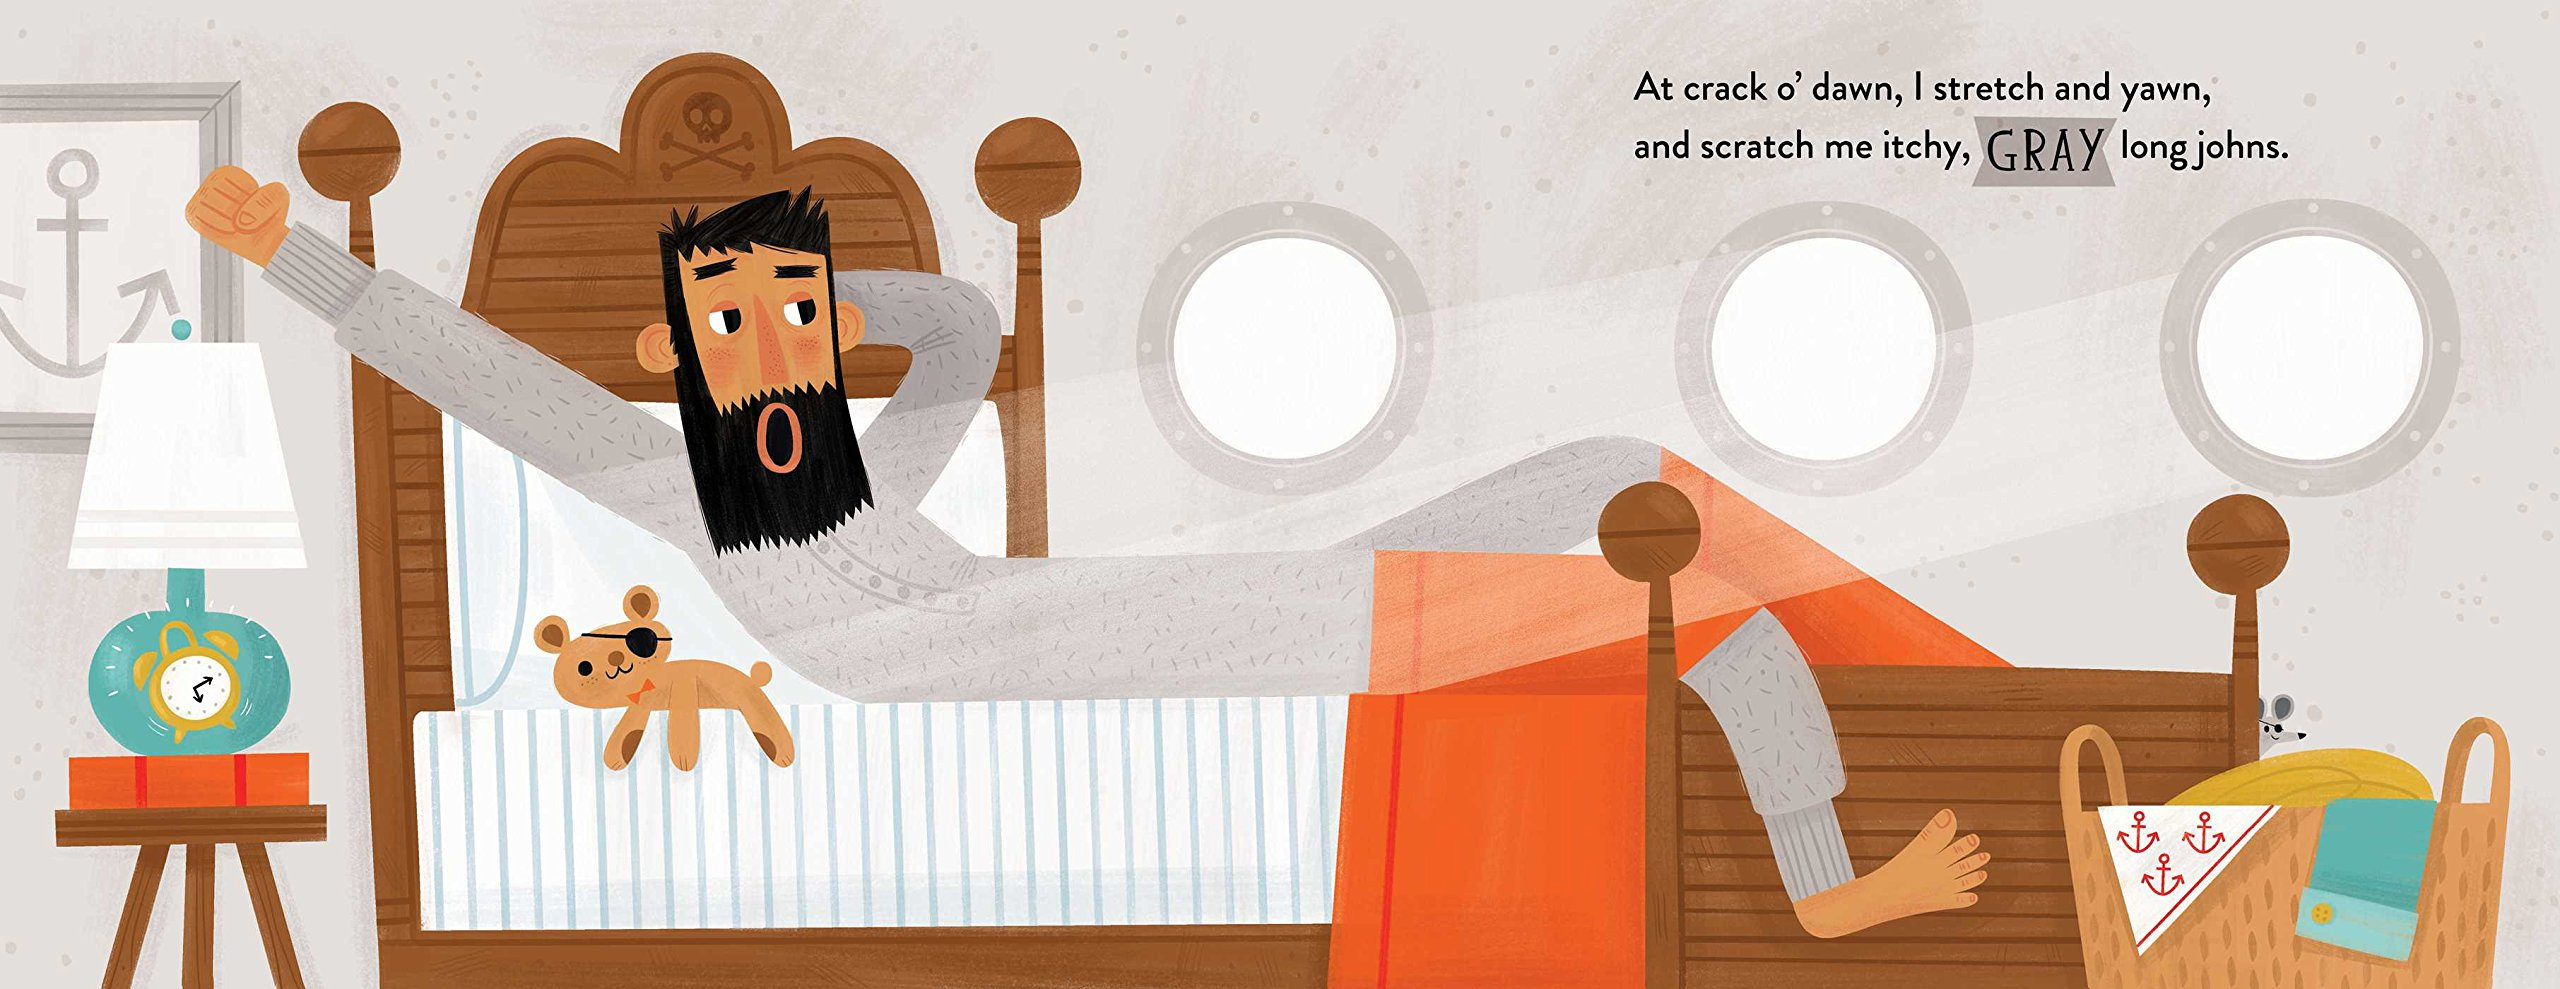 Pirate Jack gray long johns